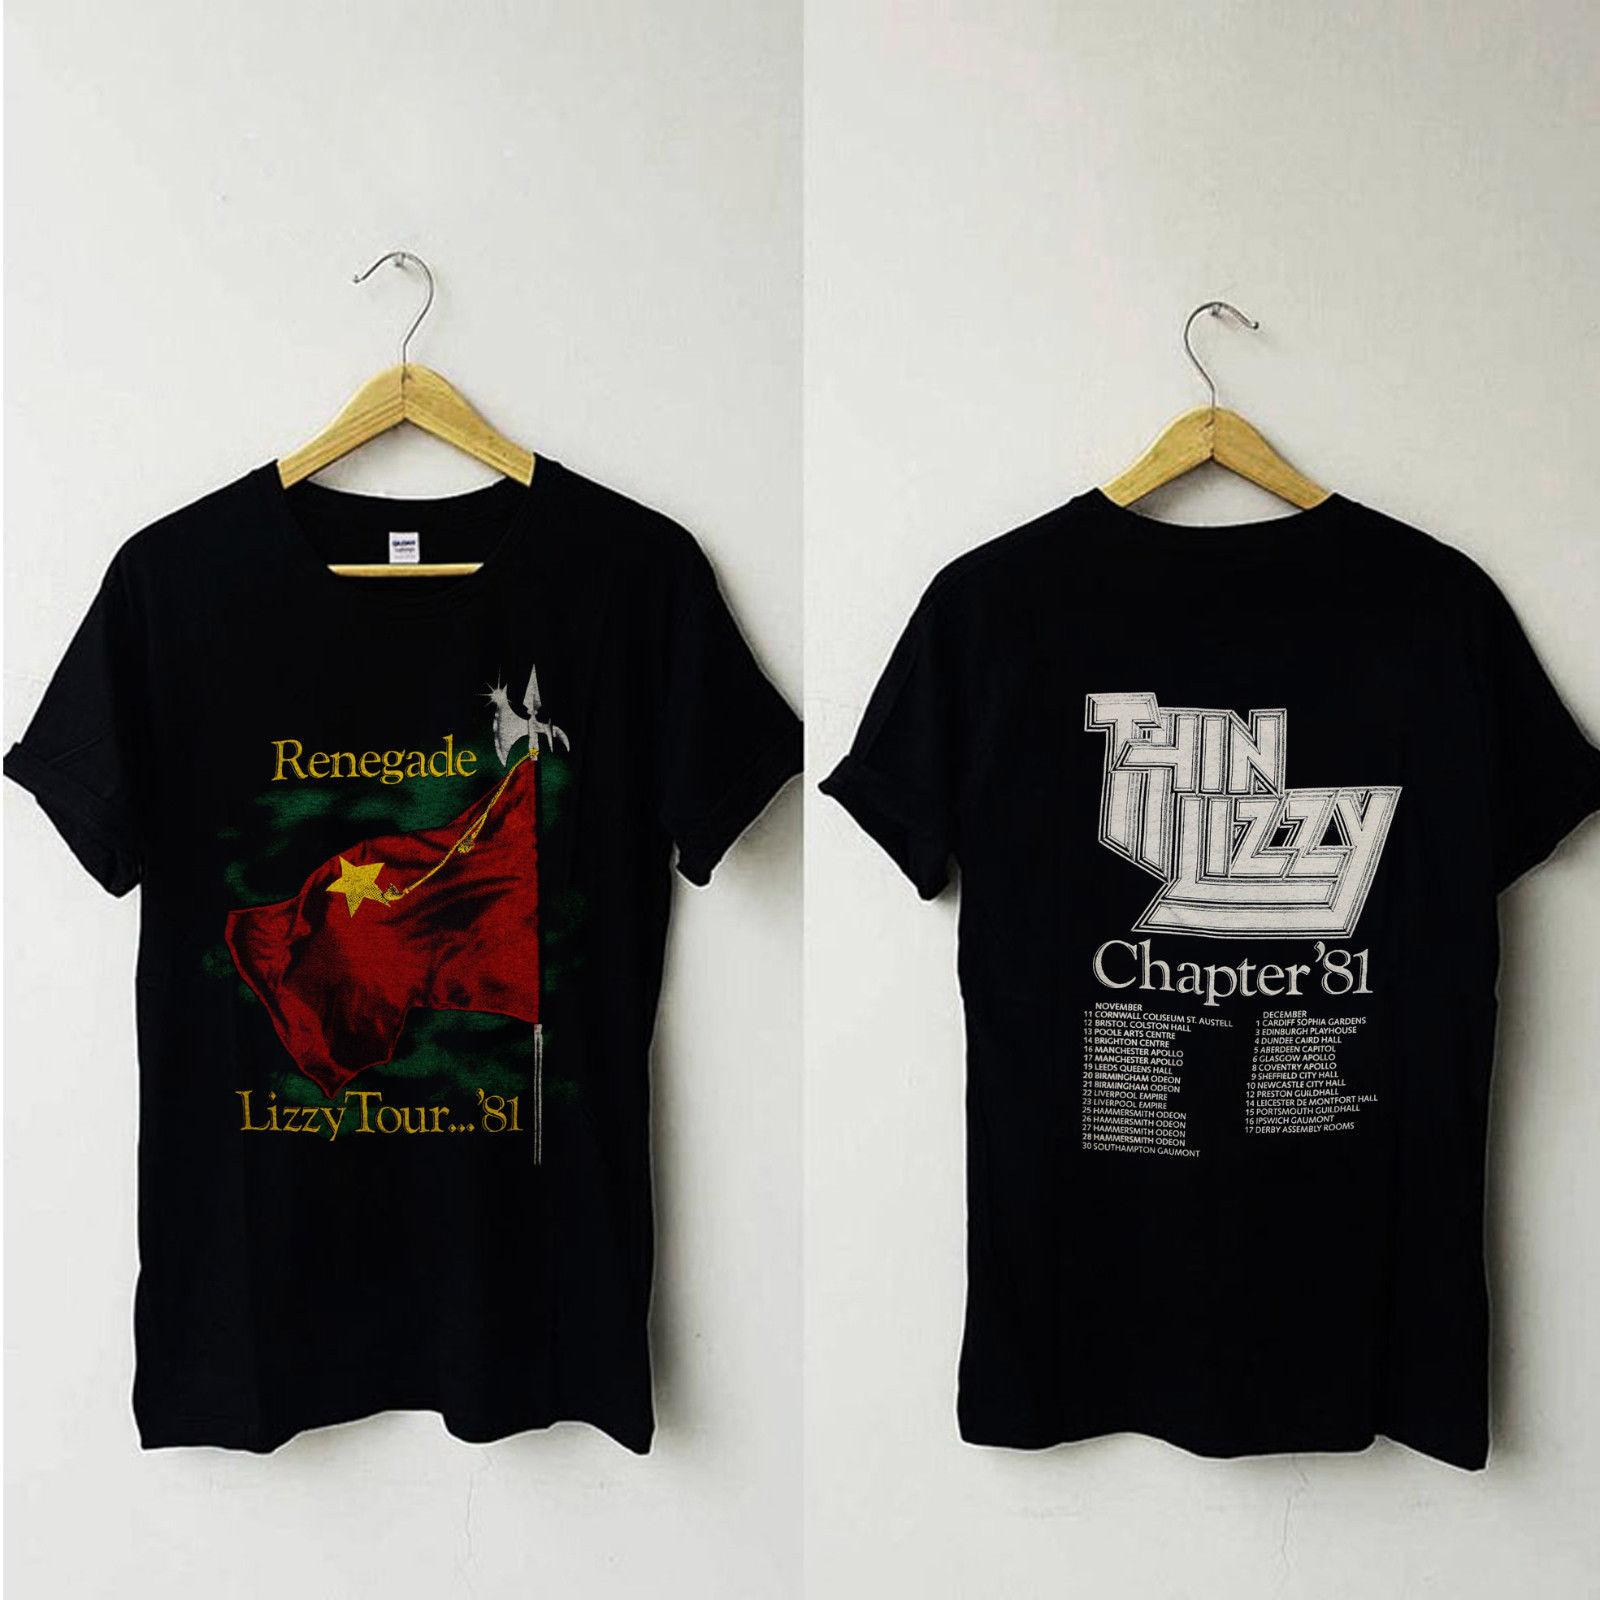 14cd32d06b3 Vintage Thin Lizzy 1981 Renegade Tour Heavy Metal Blues Rock Band Tshirt  Reprint 2018 New Men Tee 2018 Fashion T Shirts Patriotic T Shirts Funny  Tshirt From ...